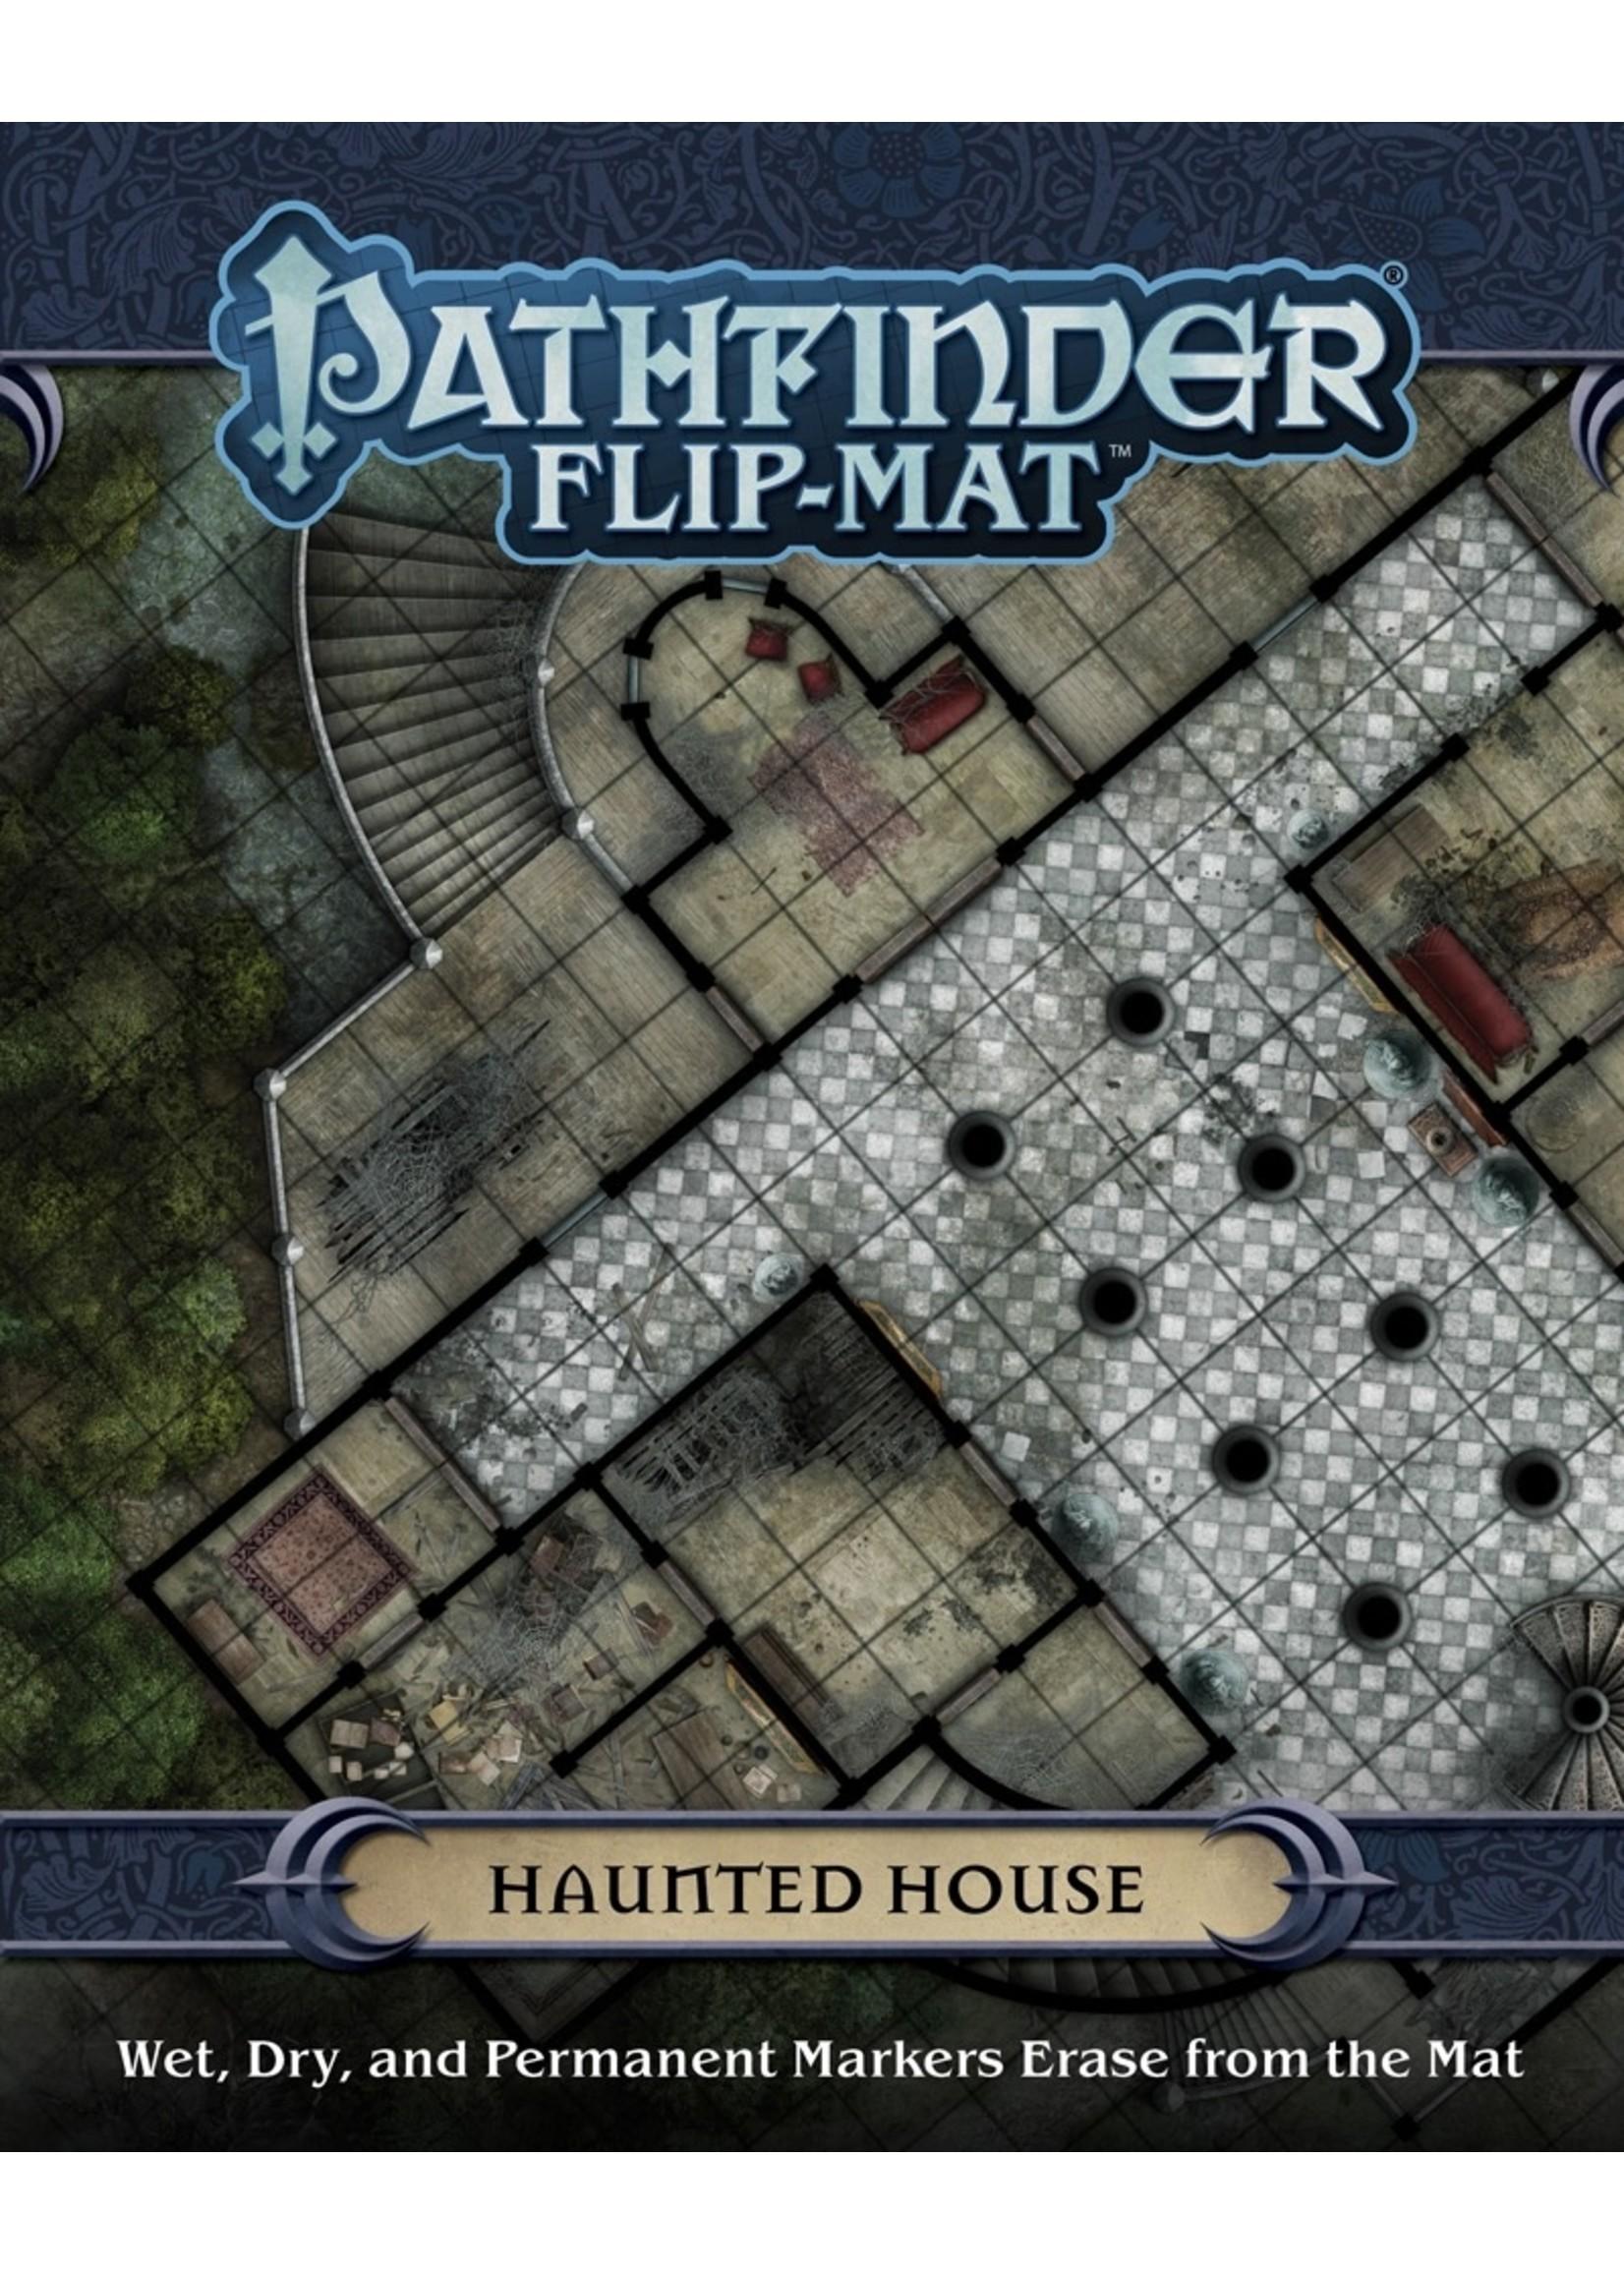 Pathfinder RPG: Flip-Mat - Haunted House